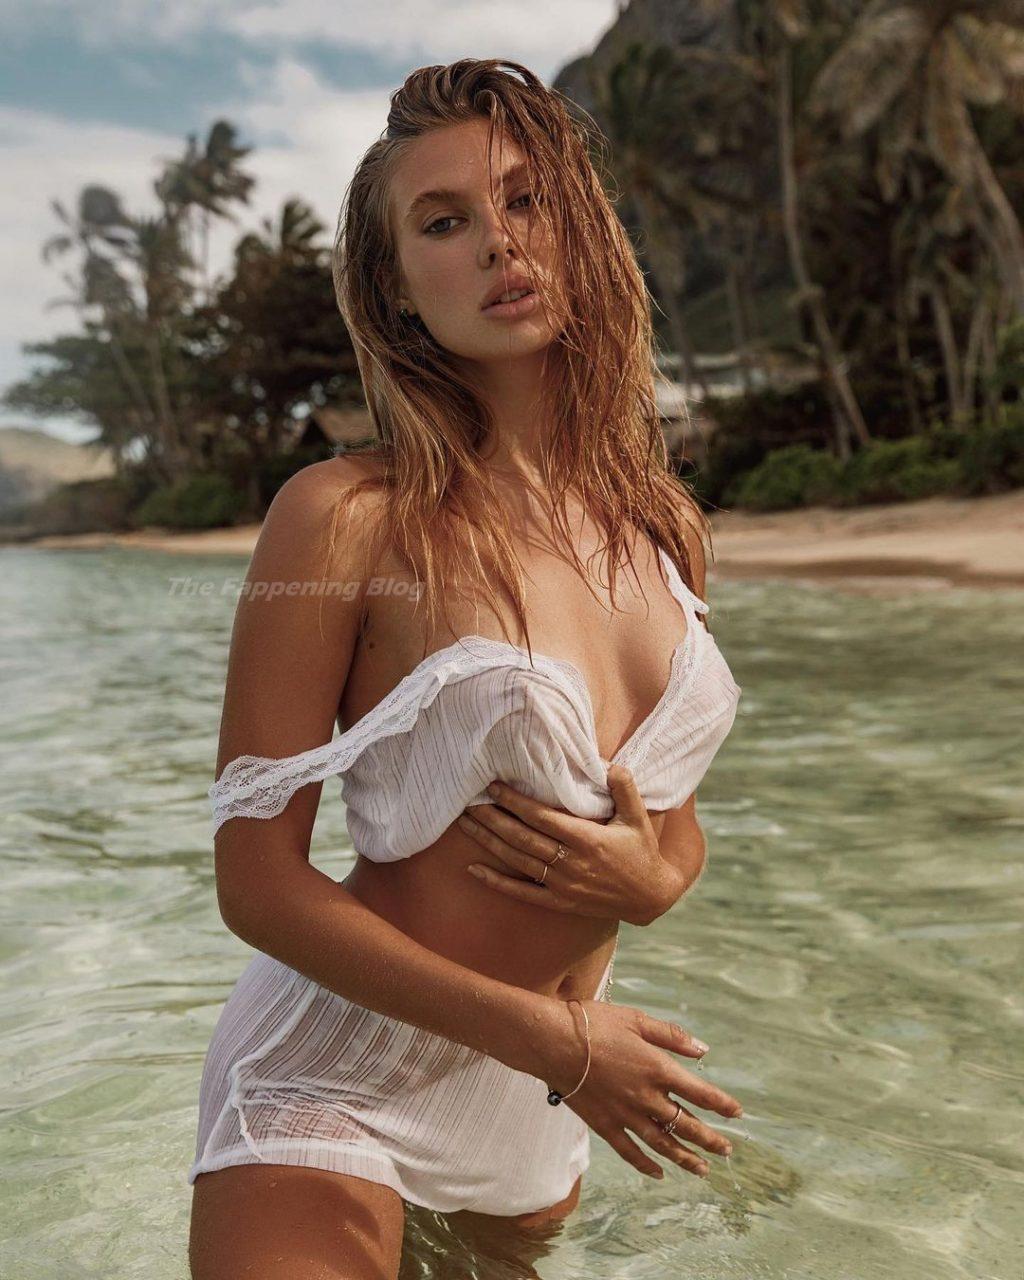 Gillian Nation Poses Naked on the Beach (3 Photos + Video)